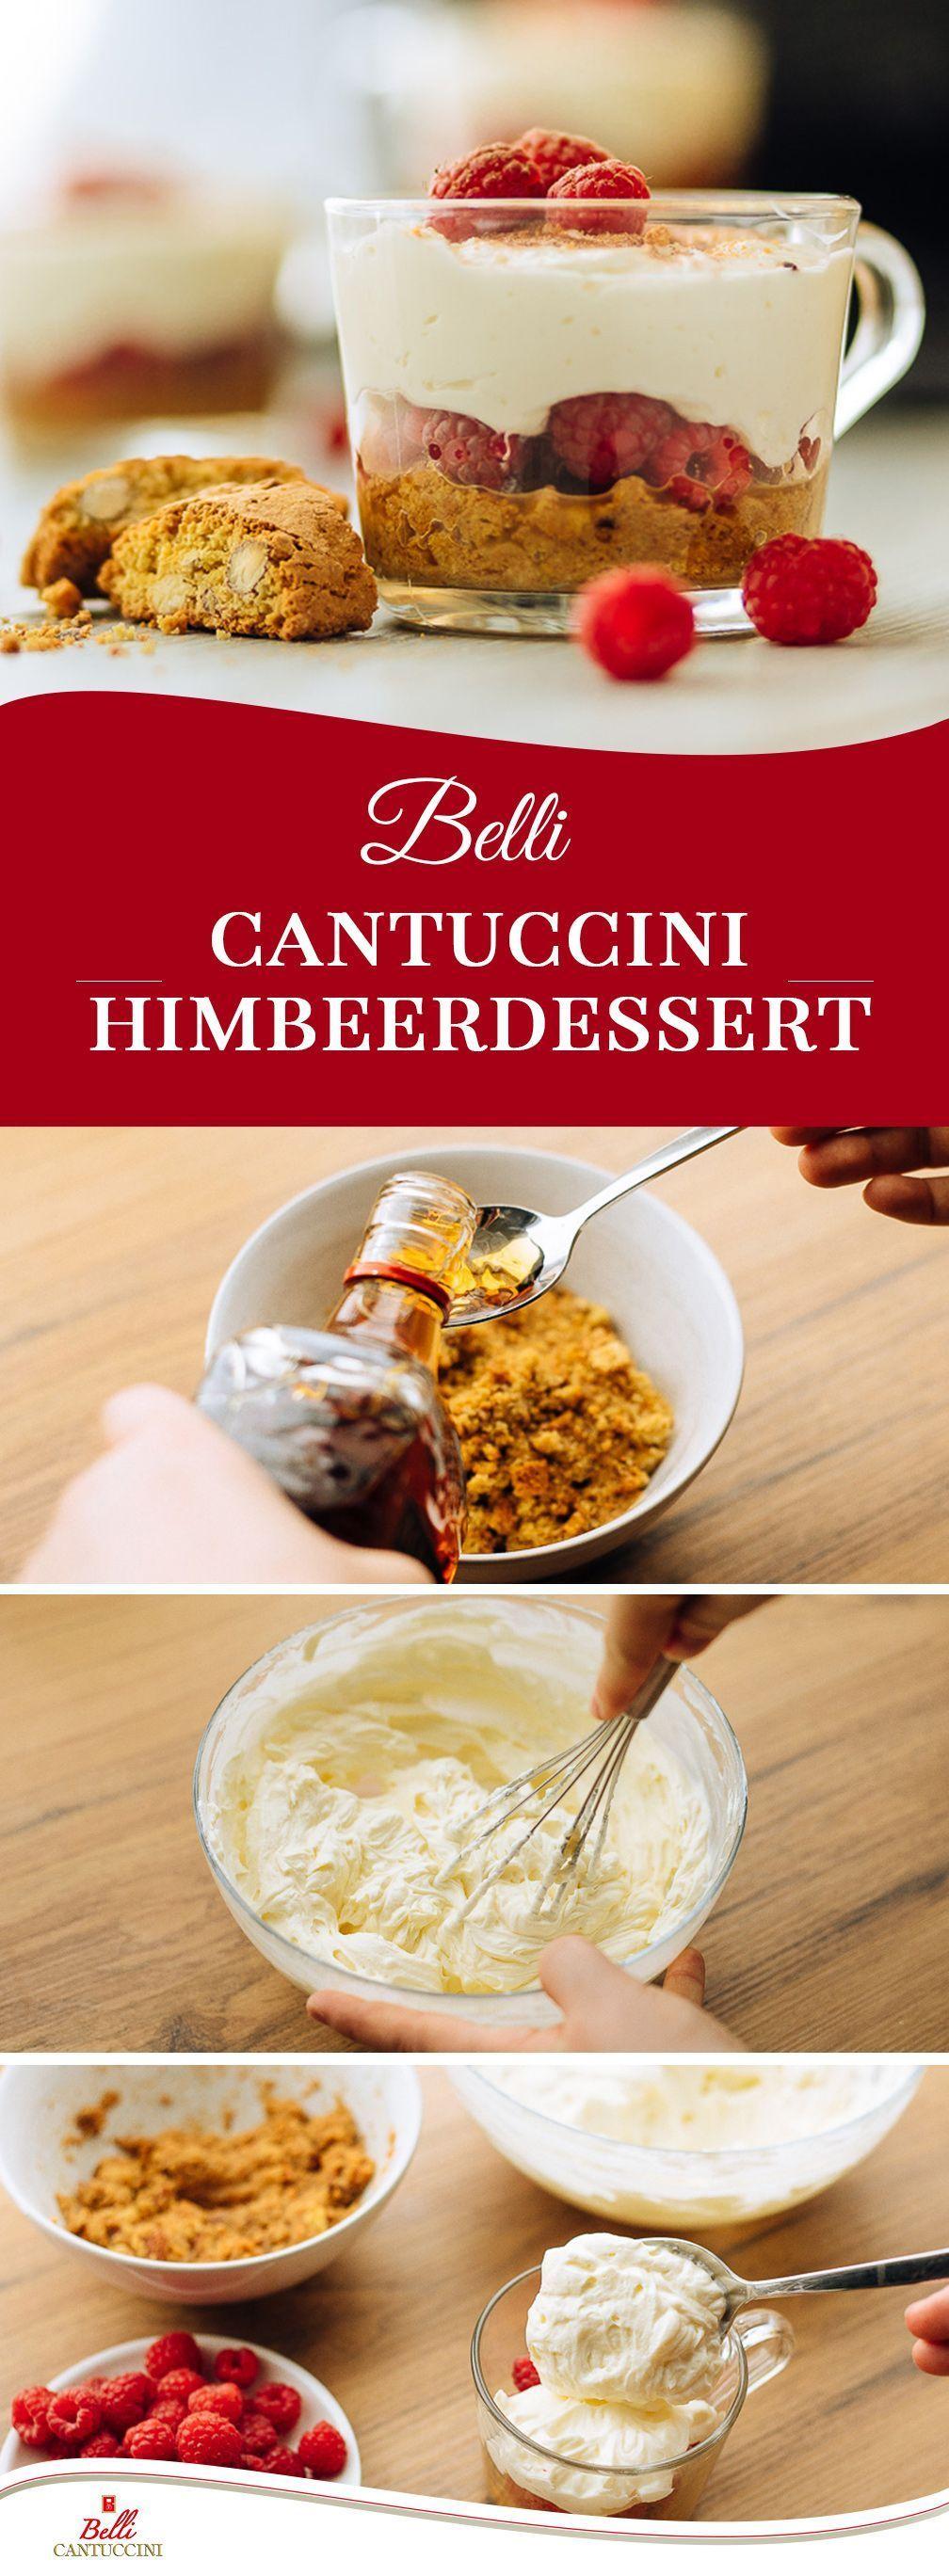 Dessert aux framboises Belli Cantuccini – Carol&RecettesChocolat